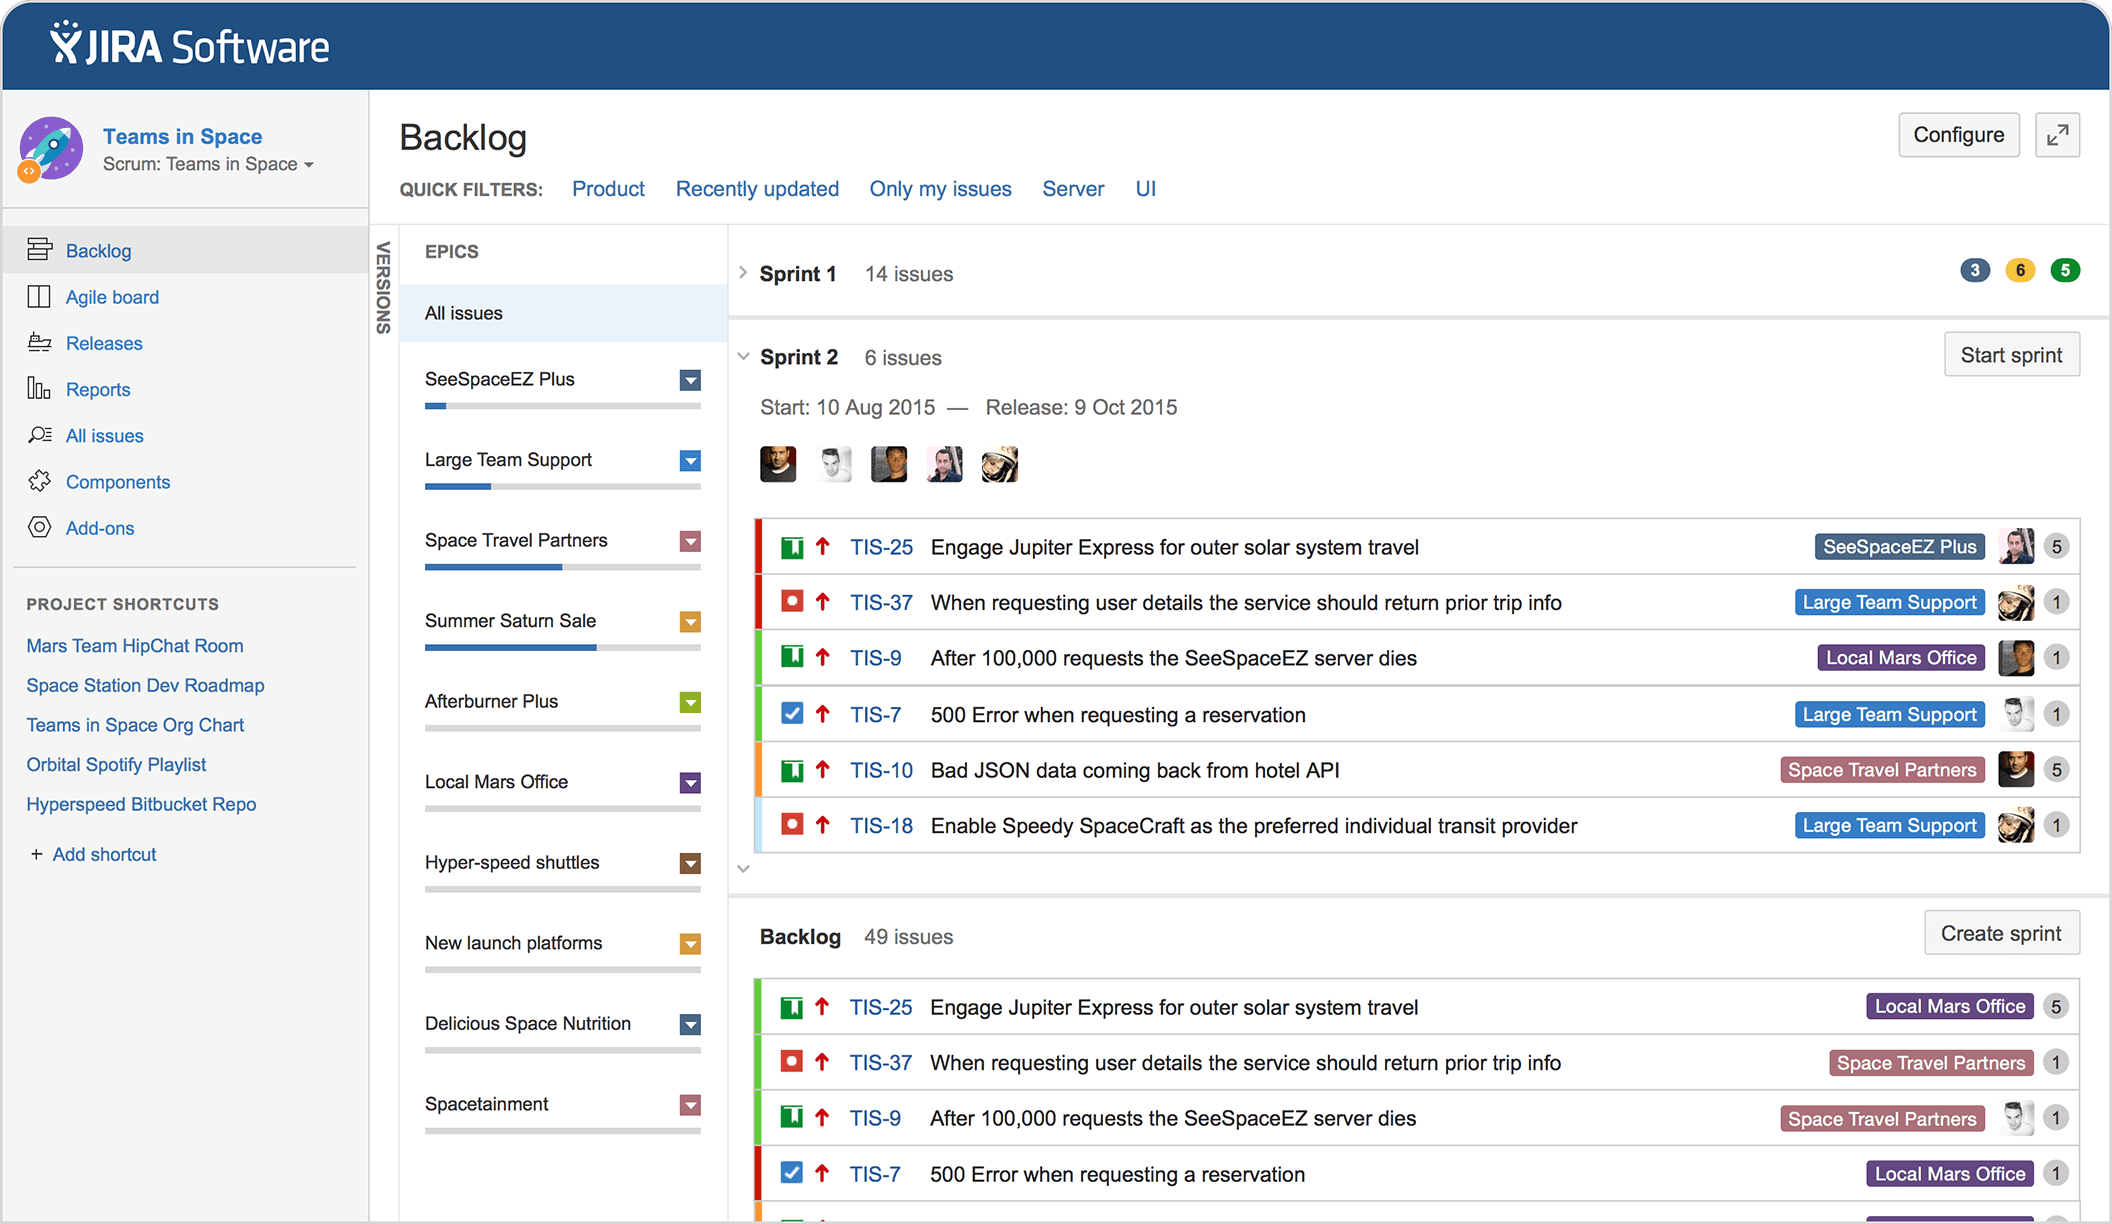 ferramenta de gerenciamento de projeto-jira-software-plan